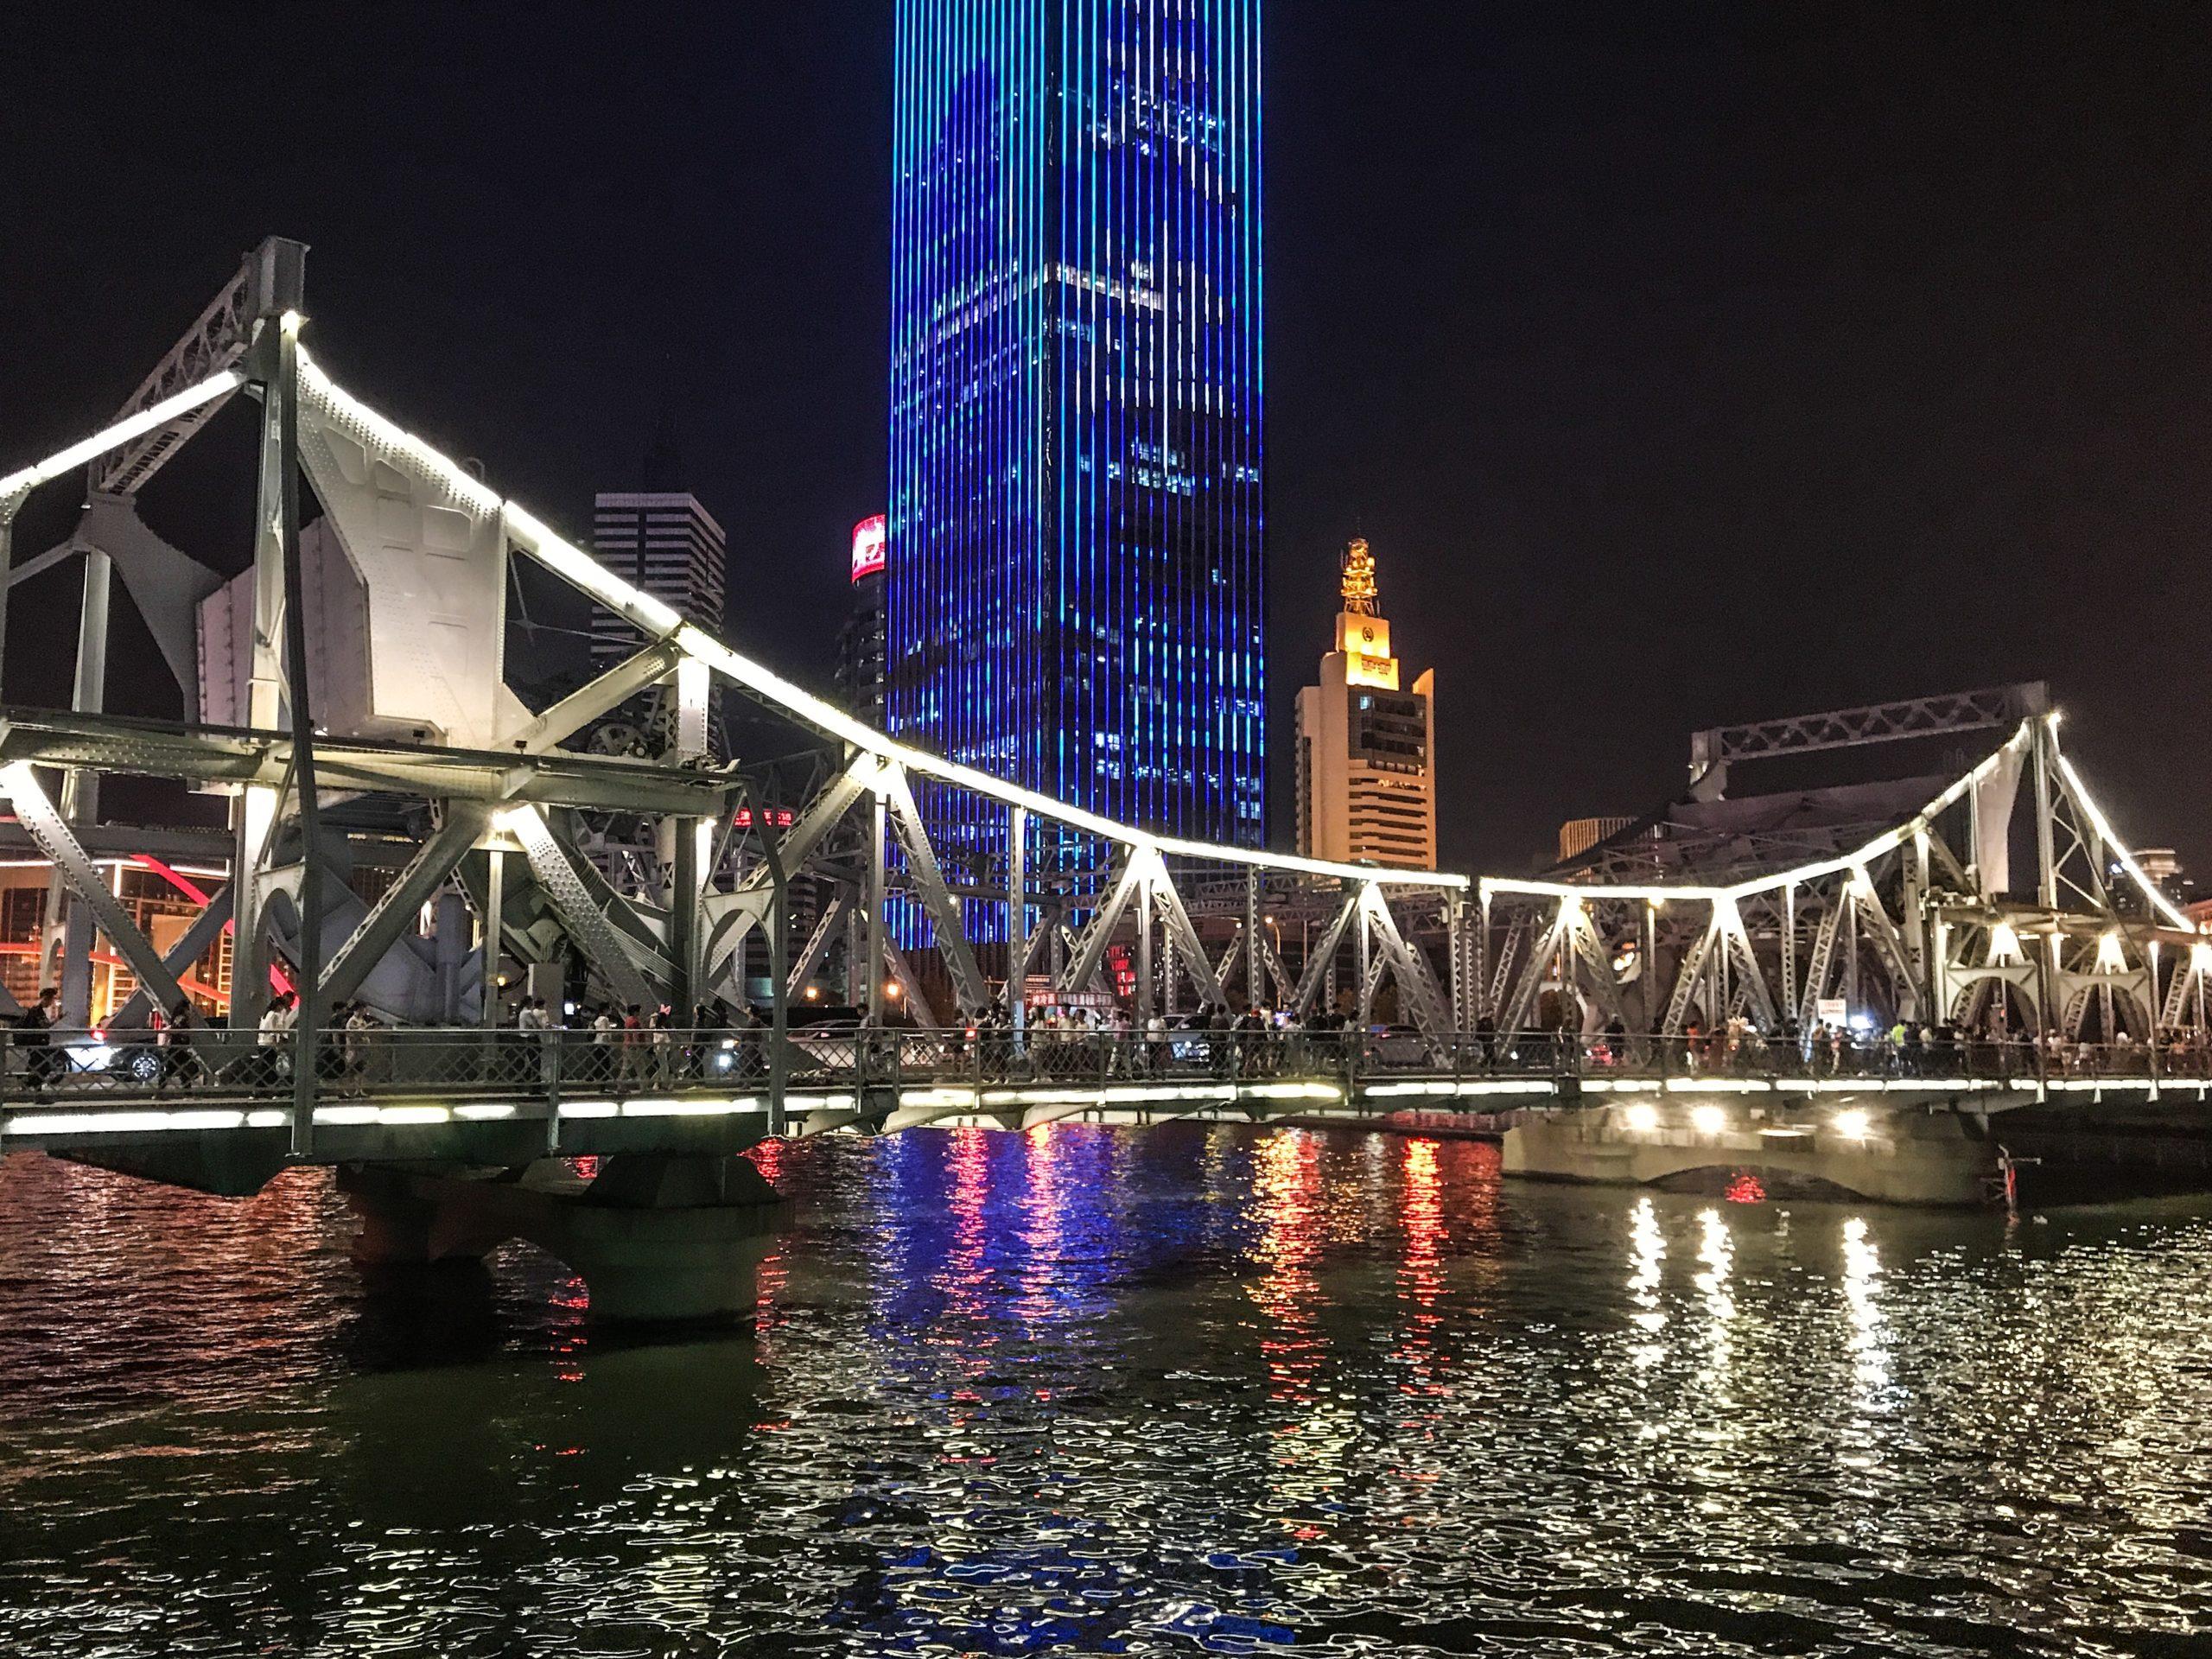 009 Jiefang Bridge 1 October 2019